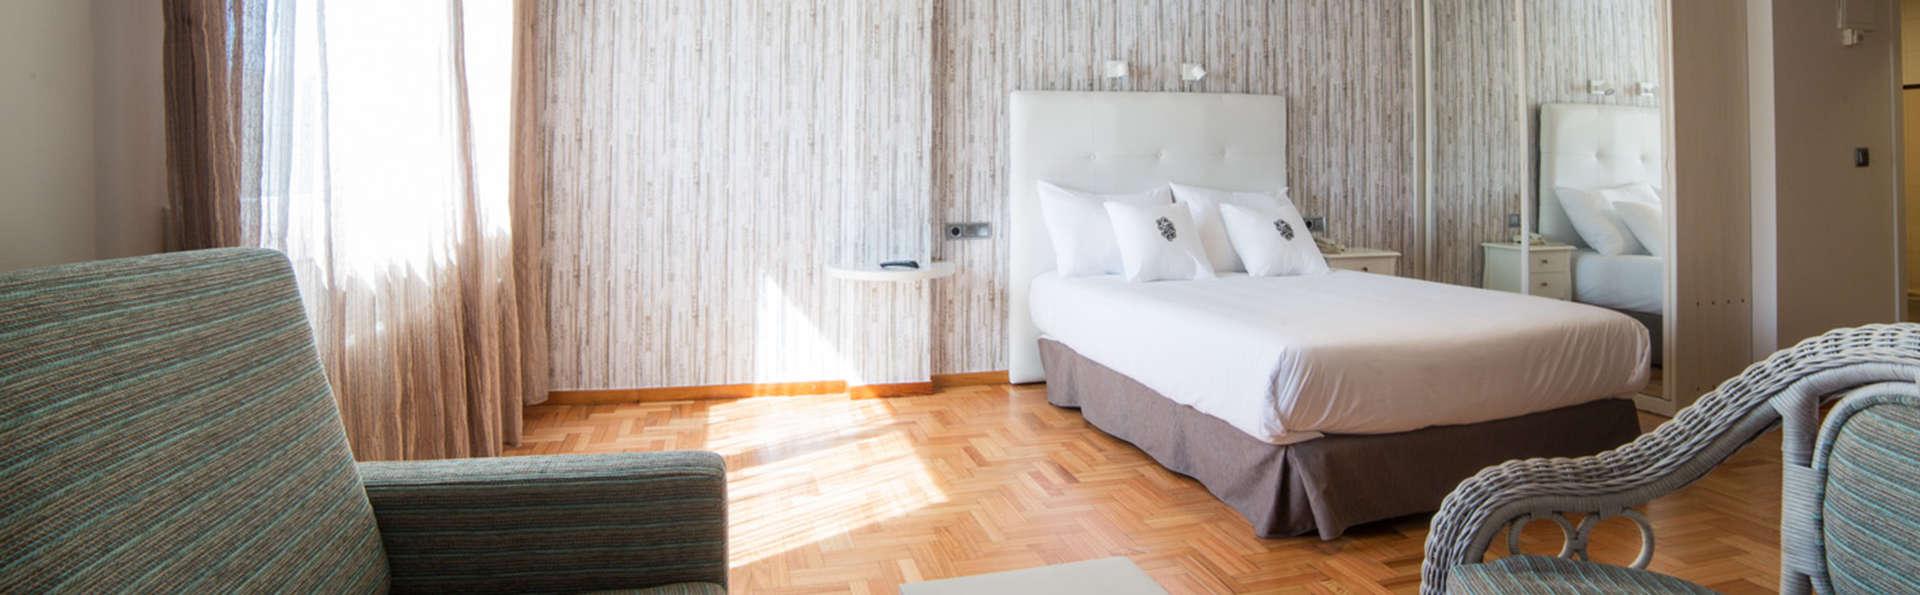 Arnoia Caldaria Hotel Balneario - EDIT_NEW_room4.jpg